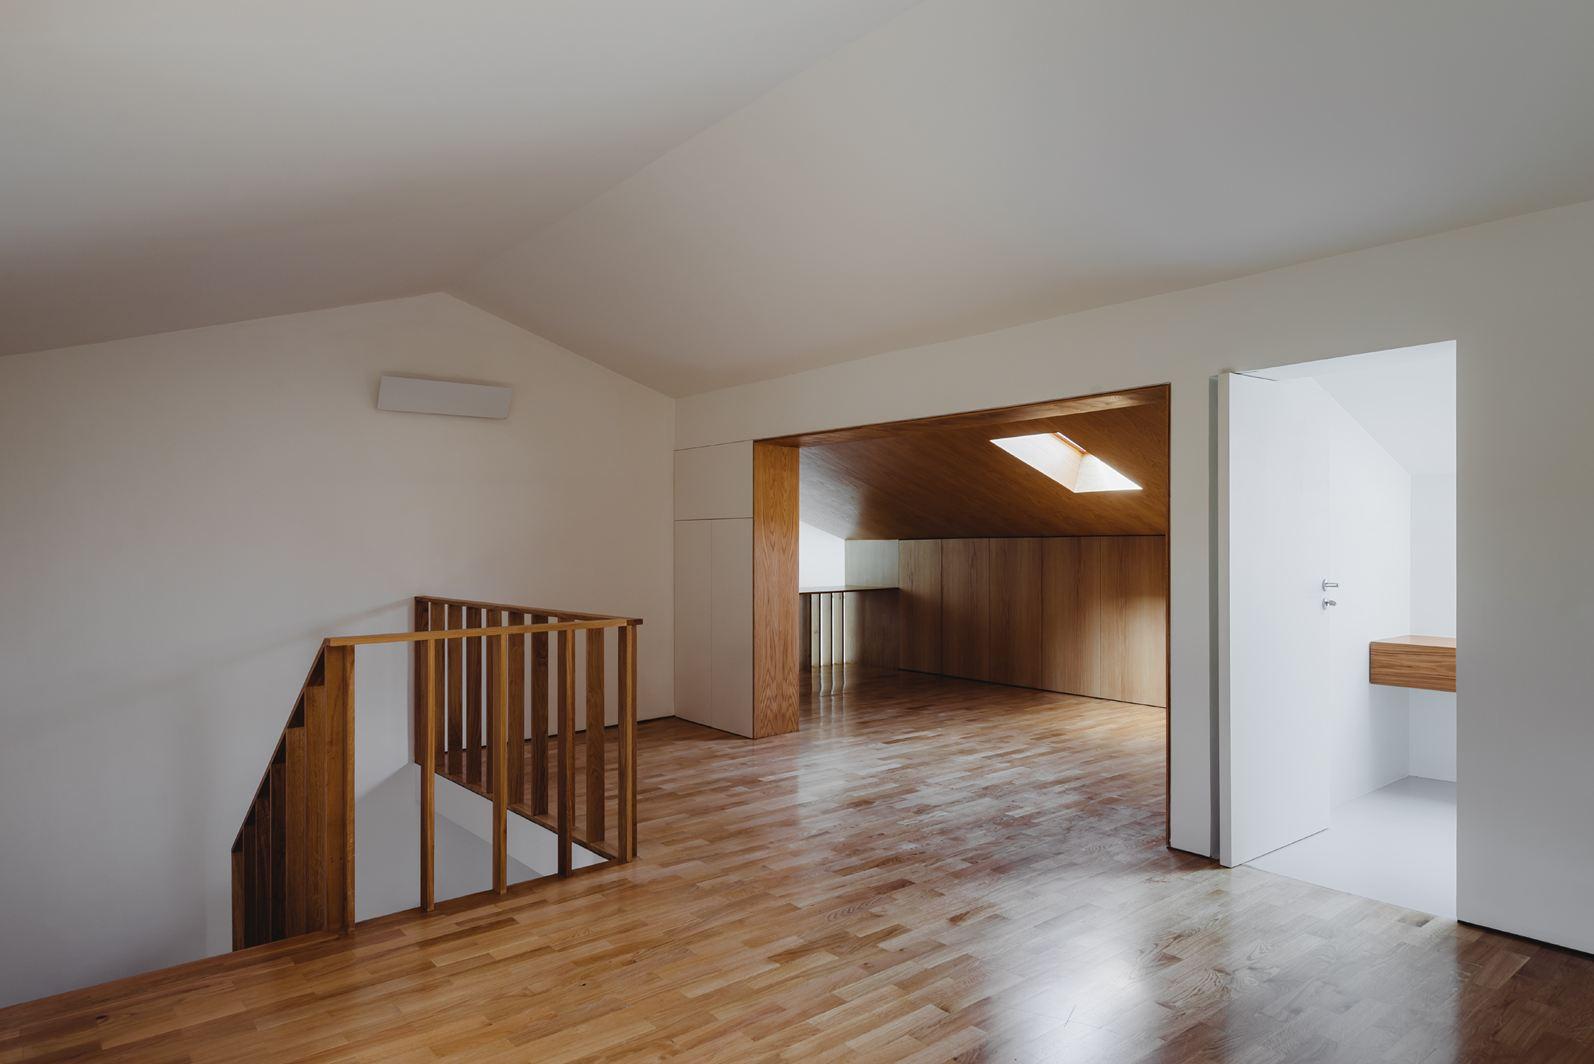 Un appartamento tra legno e luce - Tende per mansarda ikea ...